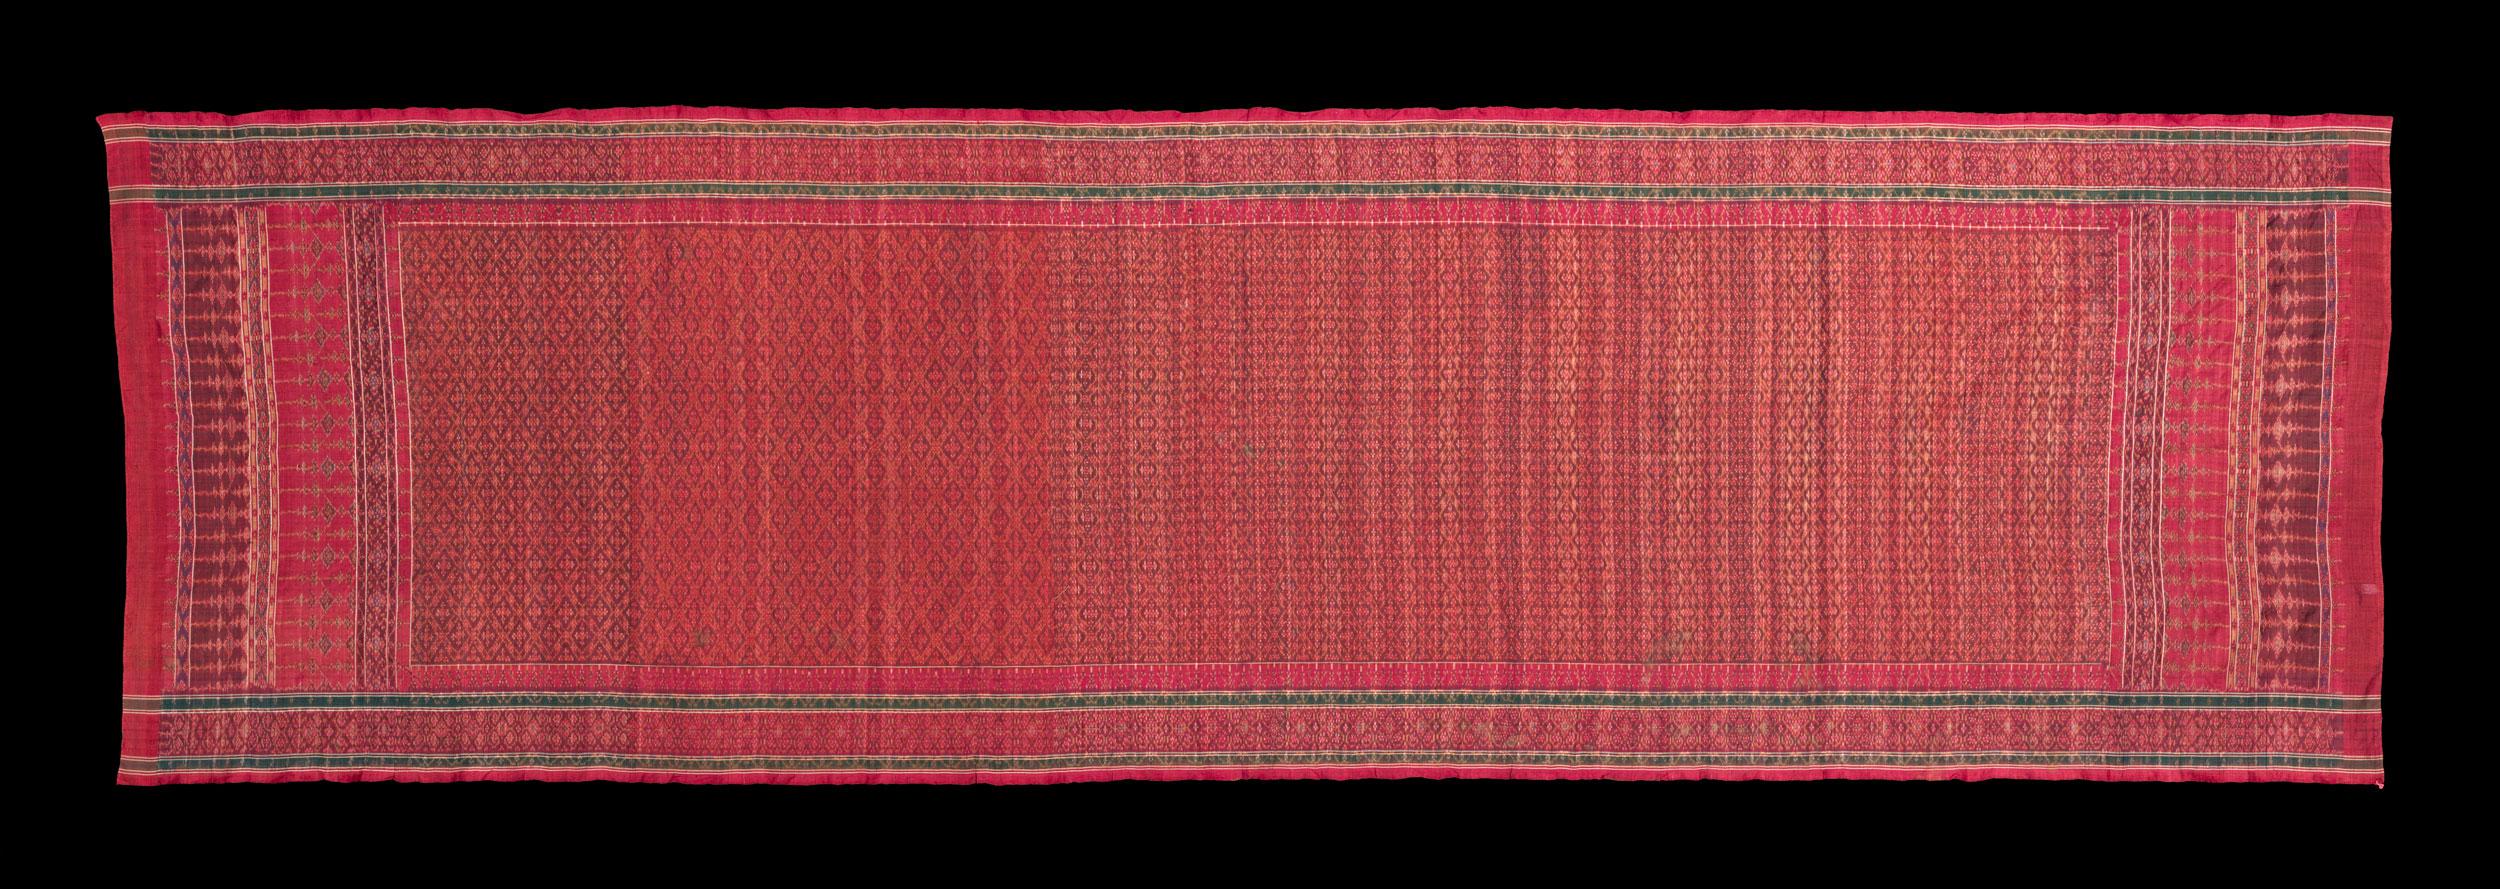 Silk Hip Wrapper for Nobleman Gift from King Mongkut to President Franklin Pierce, 1856 96 x 319 cm Courtesy of the Smithsonian Institution, Department of Anthropology; E83-0; Photo by James Di Loreto and Lucia RM Martino  ผ้านุ่งสำหรับขุนนาง ของขวัญพระราชทานจากพระบาทสมเด็จพระจอมเกล้าเจ้าอยู่หัว แก่ประธานาธิบดีแฟรงกลิน เพียร์ซ พ.ศ. ๒๓๙๙ ๙๖ x ๓๑๙ ซม. ได้รับความอนุเคราะห์จากฝ่ายมานุษยวิทยา สถาบันสมิธโซเนียน; E83-0; ถ่ายโดยเจมส์ ดิลอเรโต และลูเซีย อาร์เอ็ม มาร์ติโน